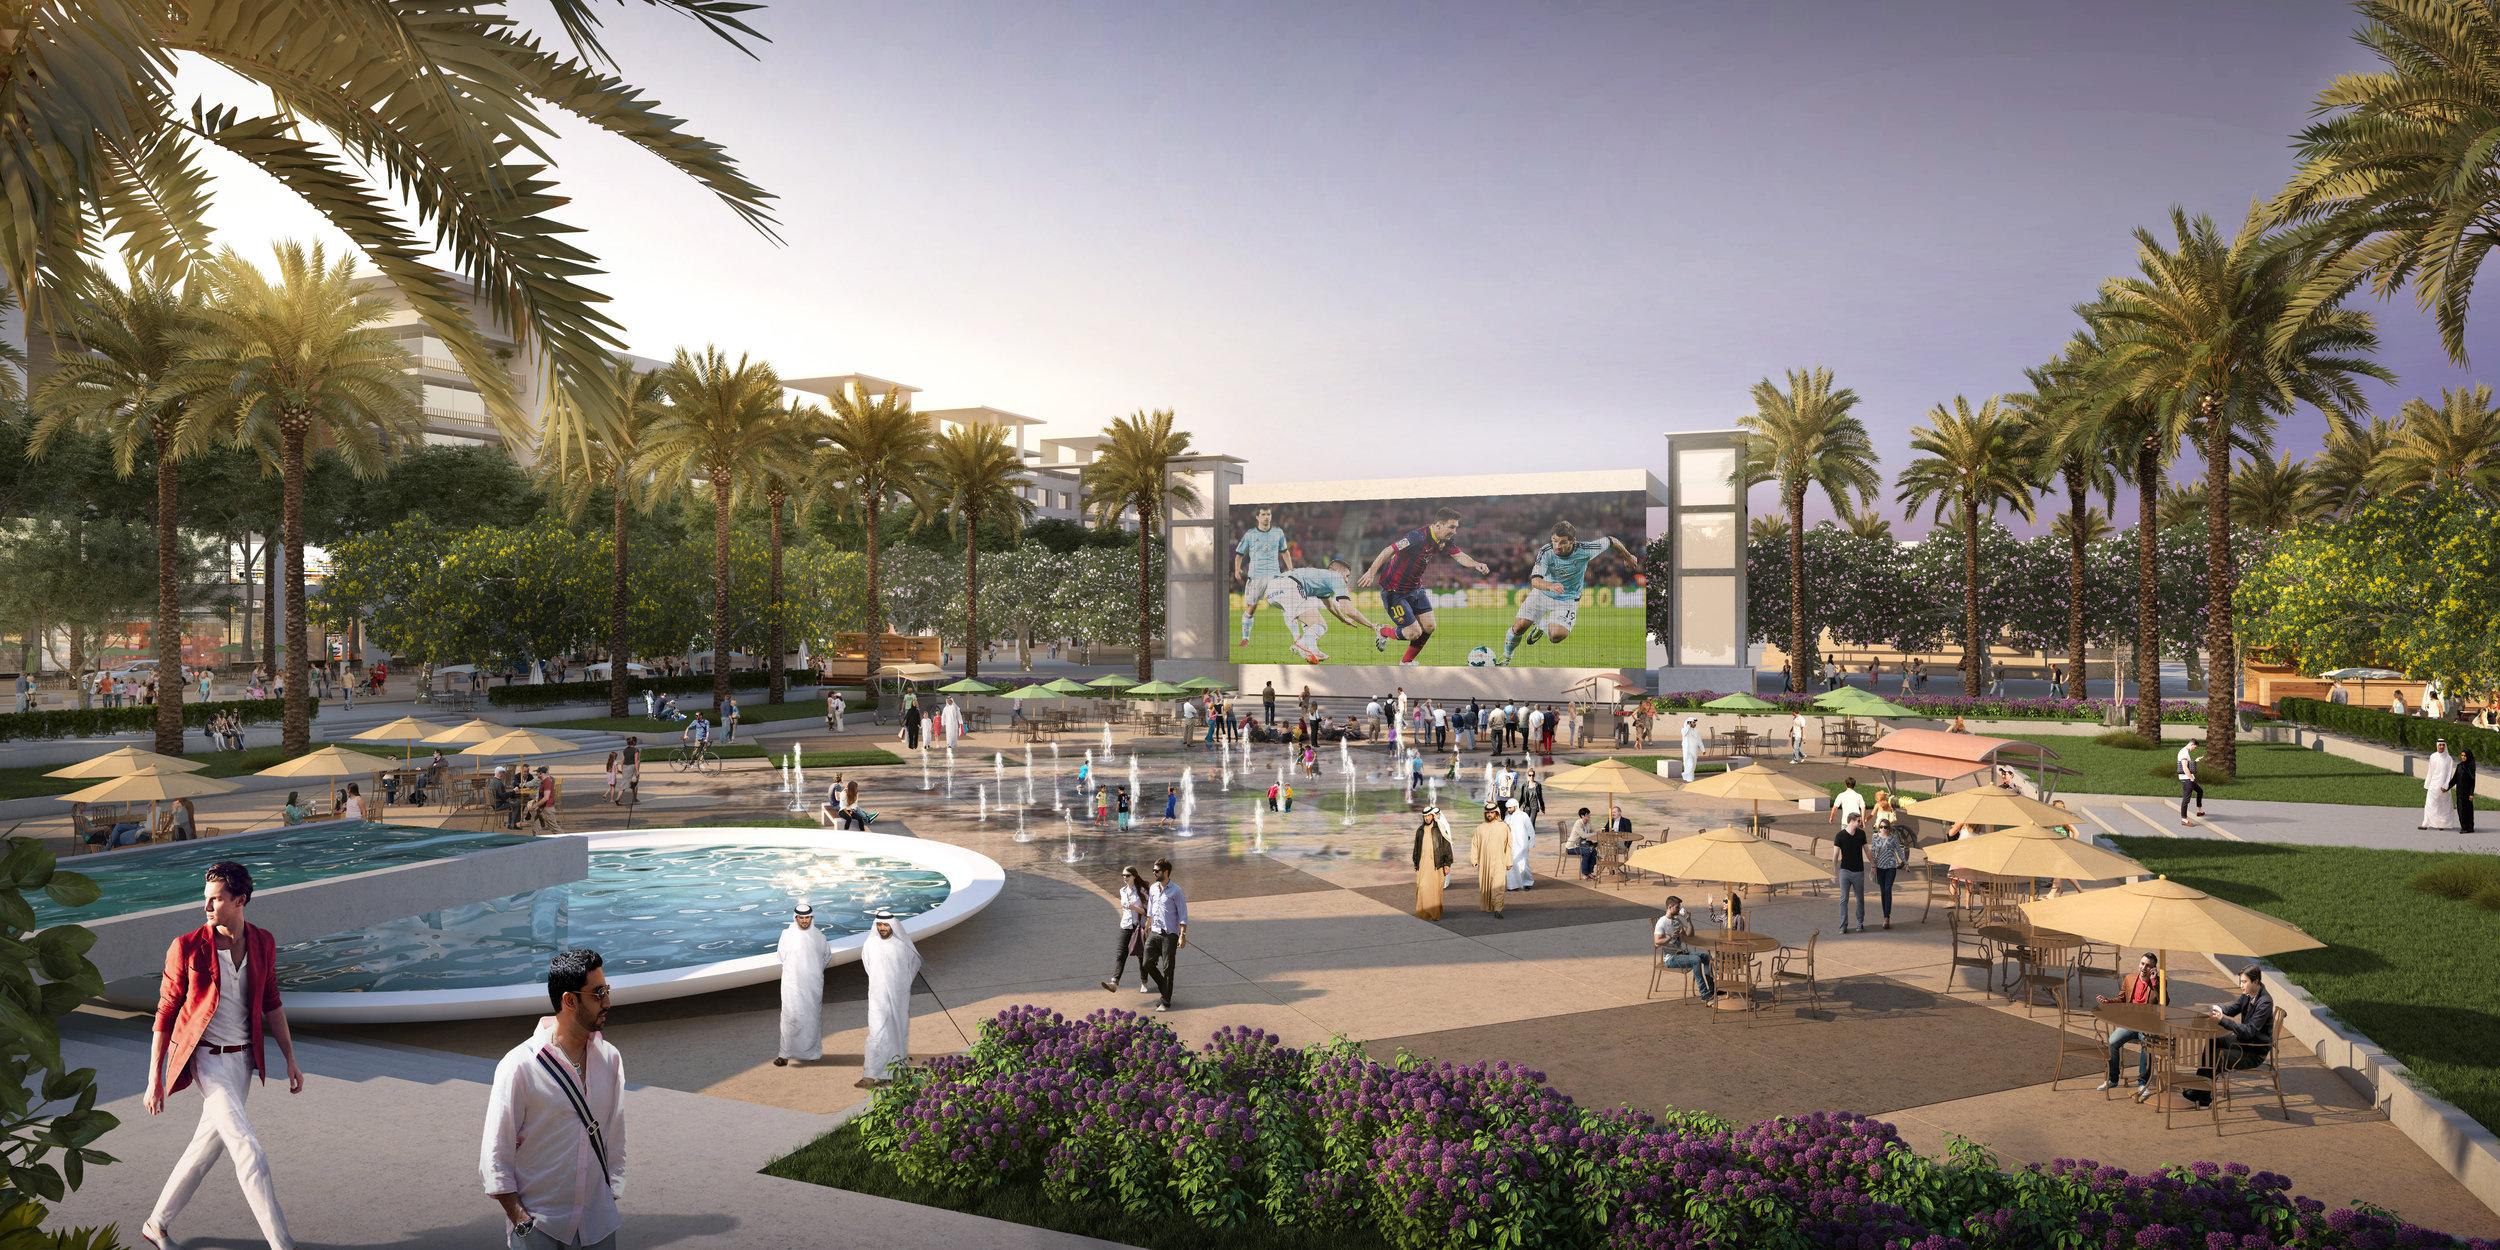 Town Square Dubai Urban Plaza Design 12.jpg